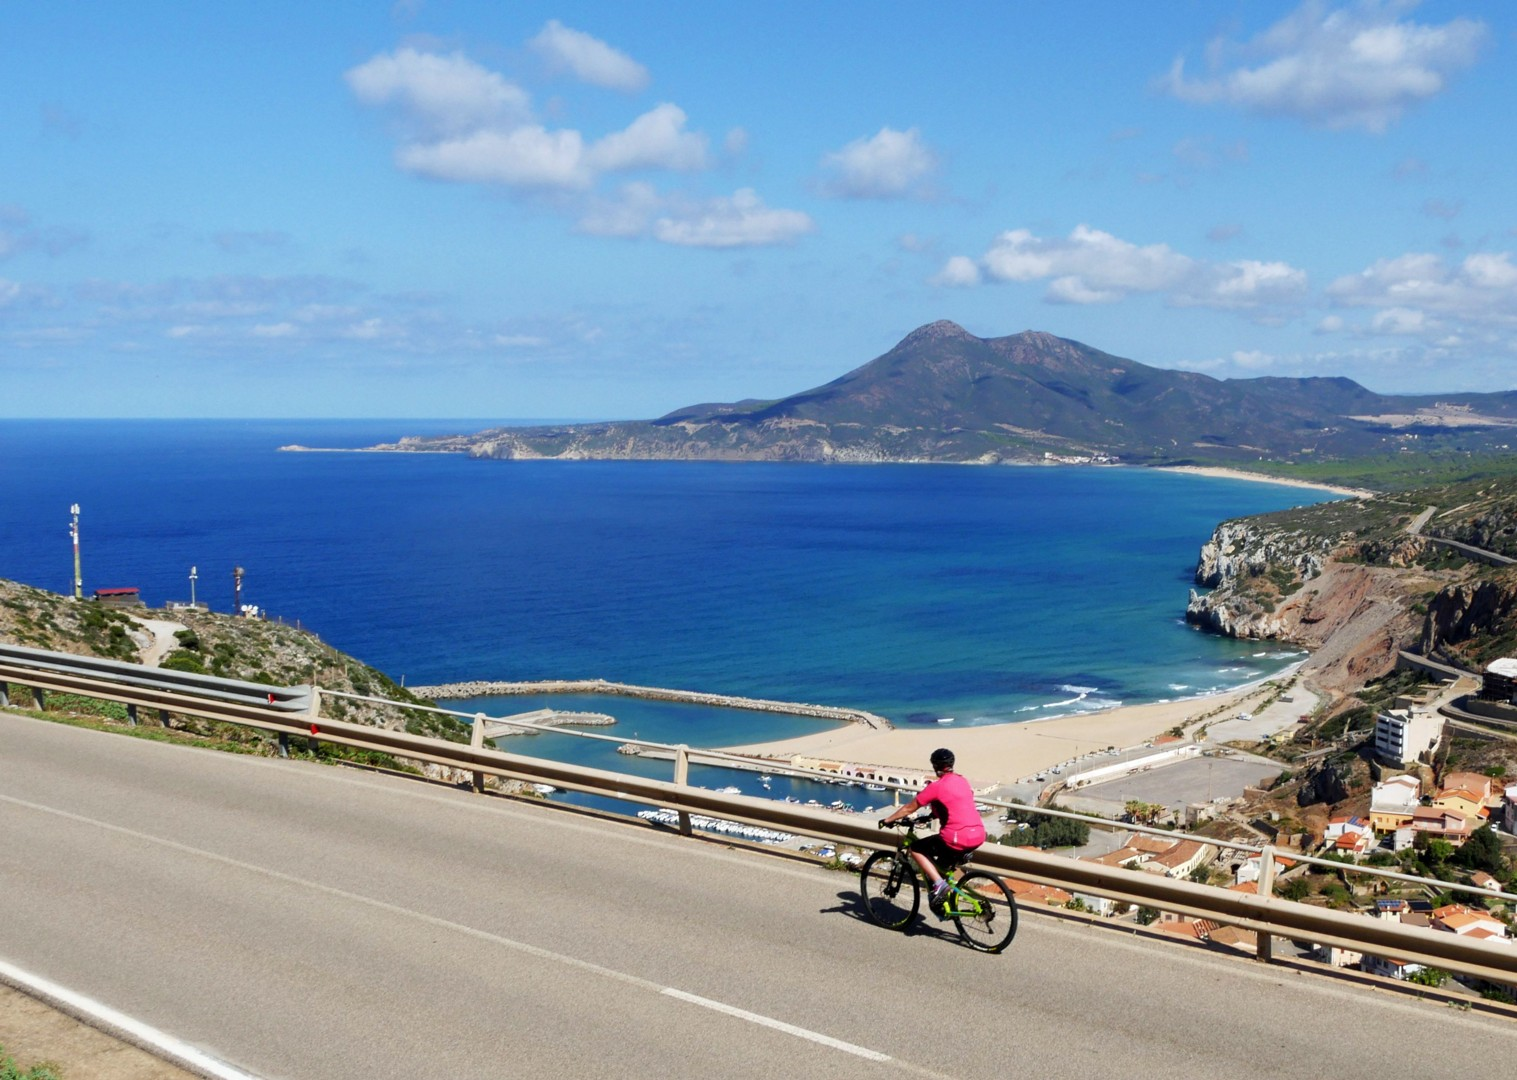 cycling-holiday-sardinia-islands.jpg - Italy - Sardinia - Island Flavours - Self-Guided Leisure Cycling Holiday - Italia Leisure and Family Cycling